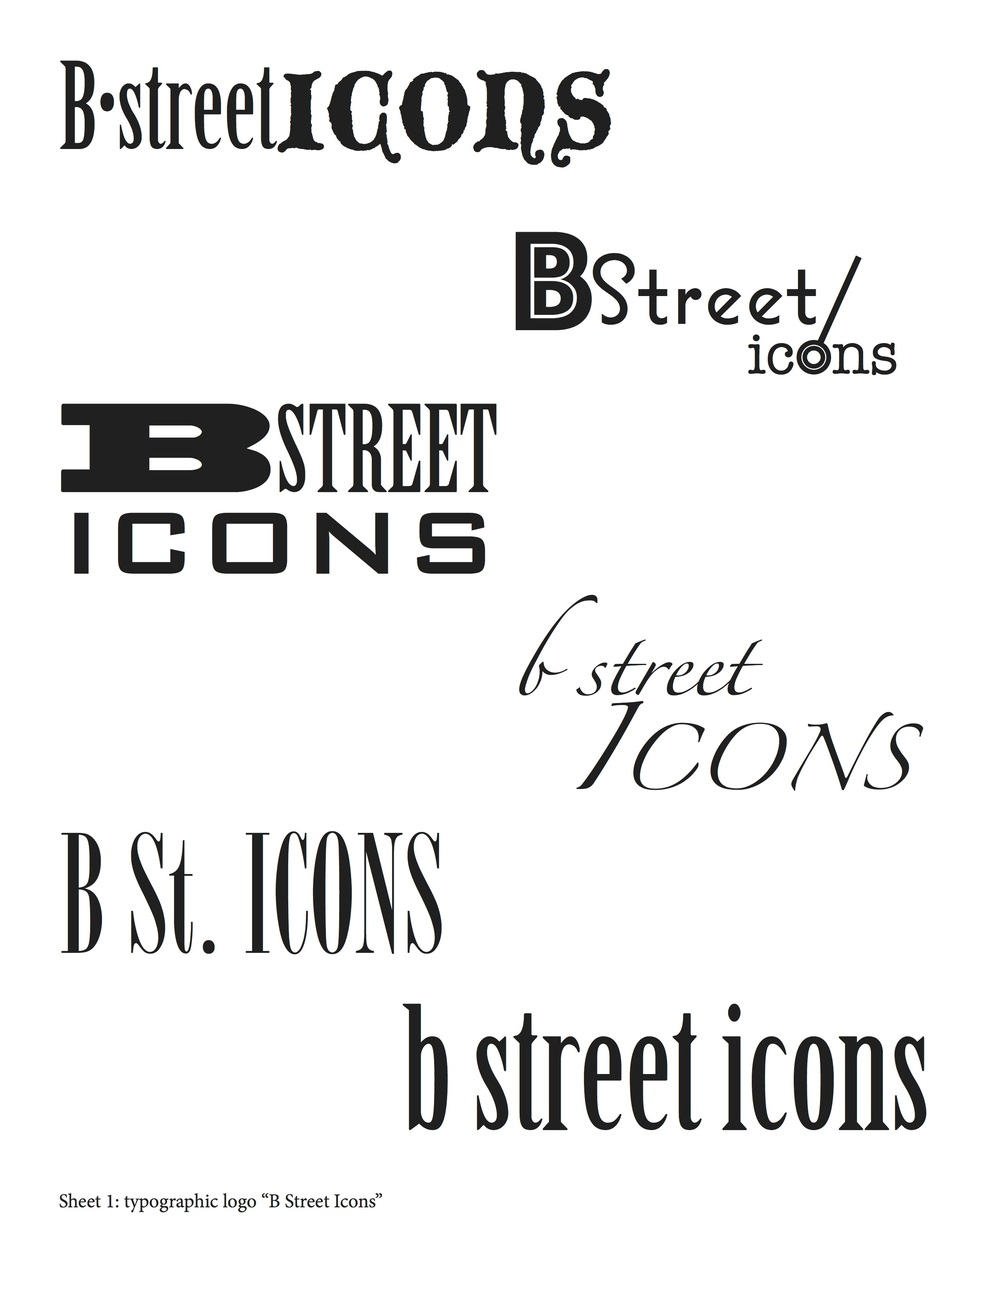 b street icons type 1.jpg